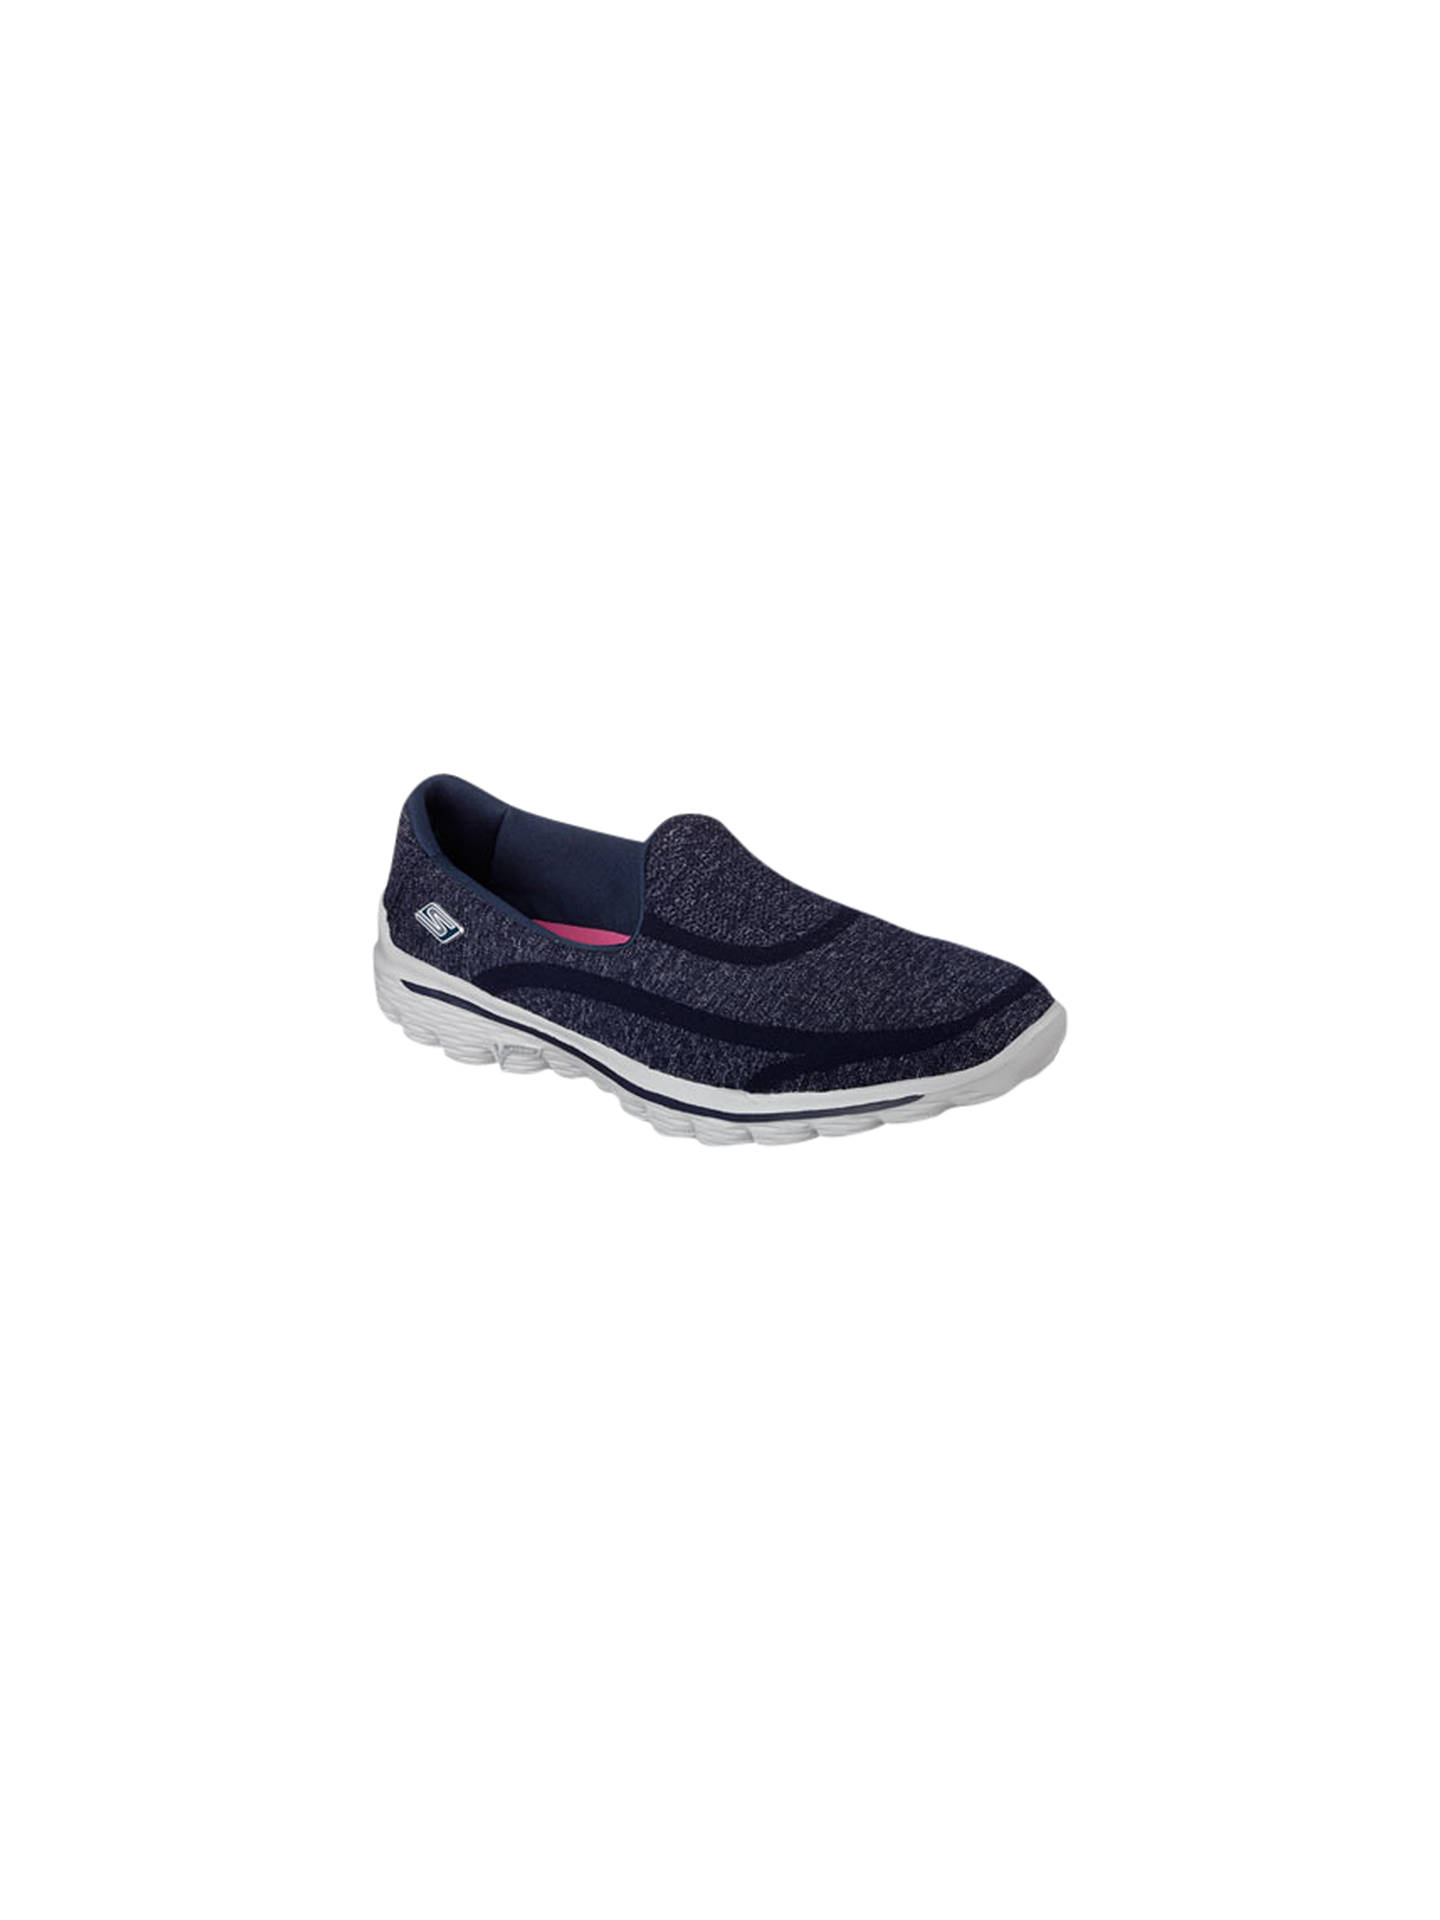 BuySkechers GOwalk 2 Super Sock Walking Shoes, Navy, 4 Online at johnlewis.com